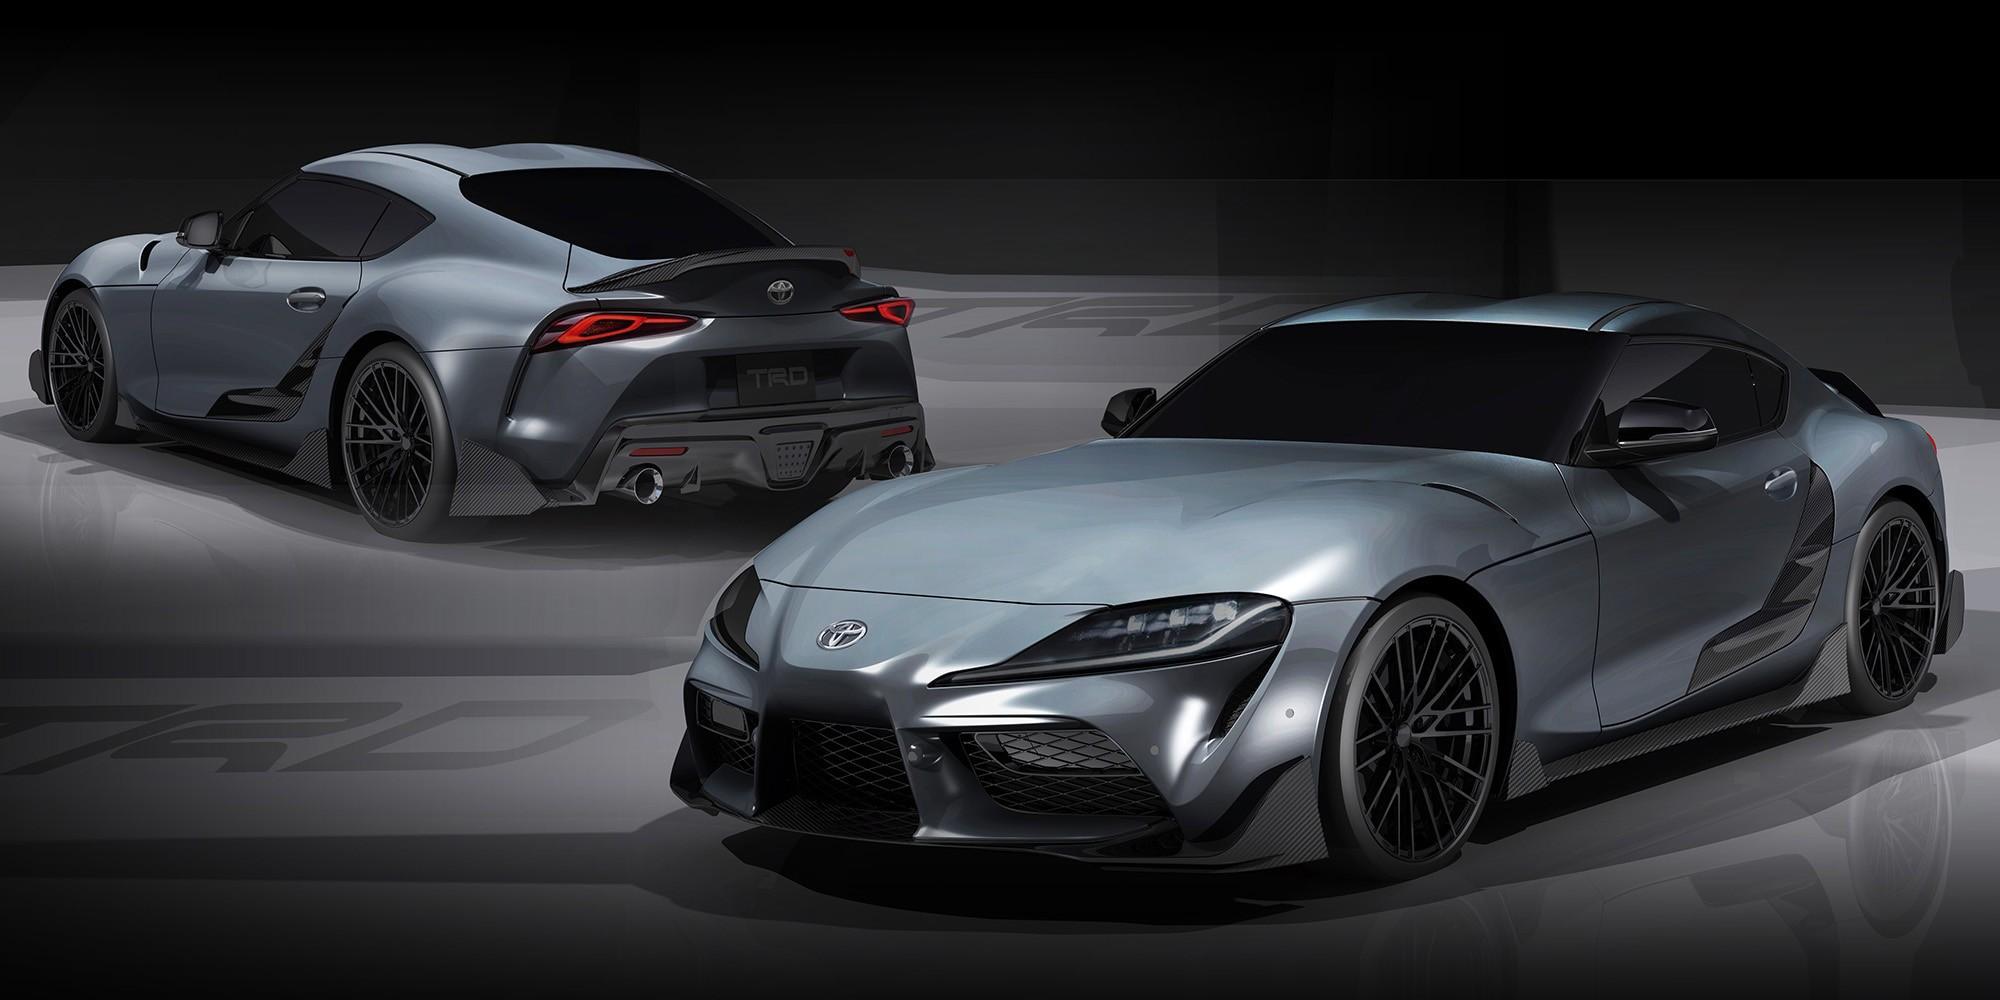 Toyota Gr Supra Performance Line Concept Trd Looks